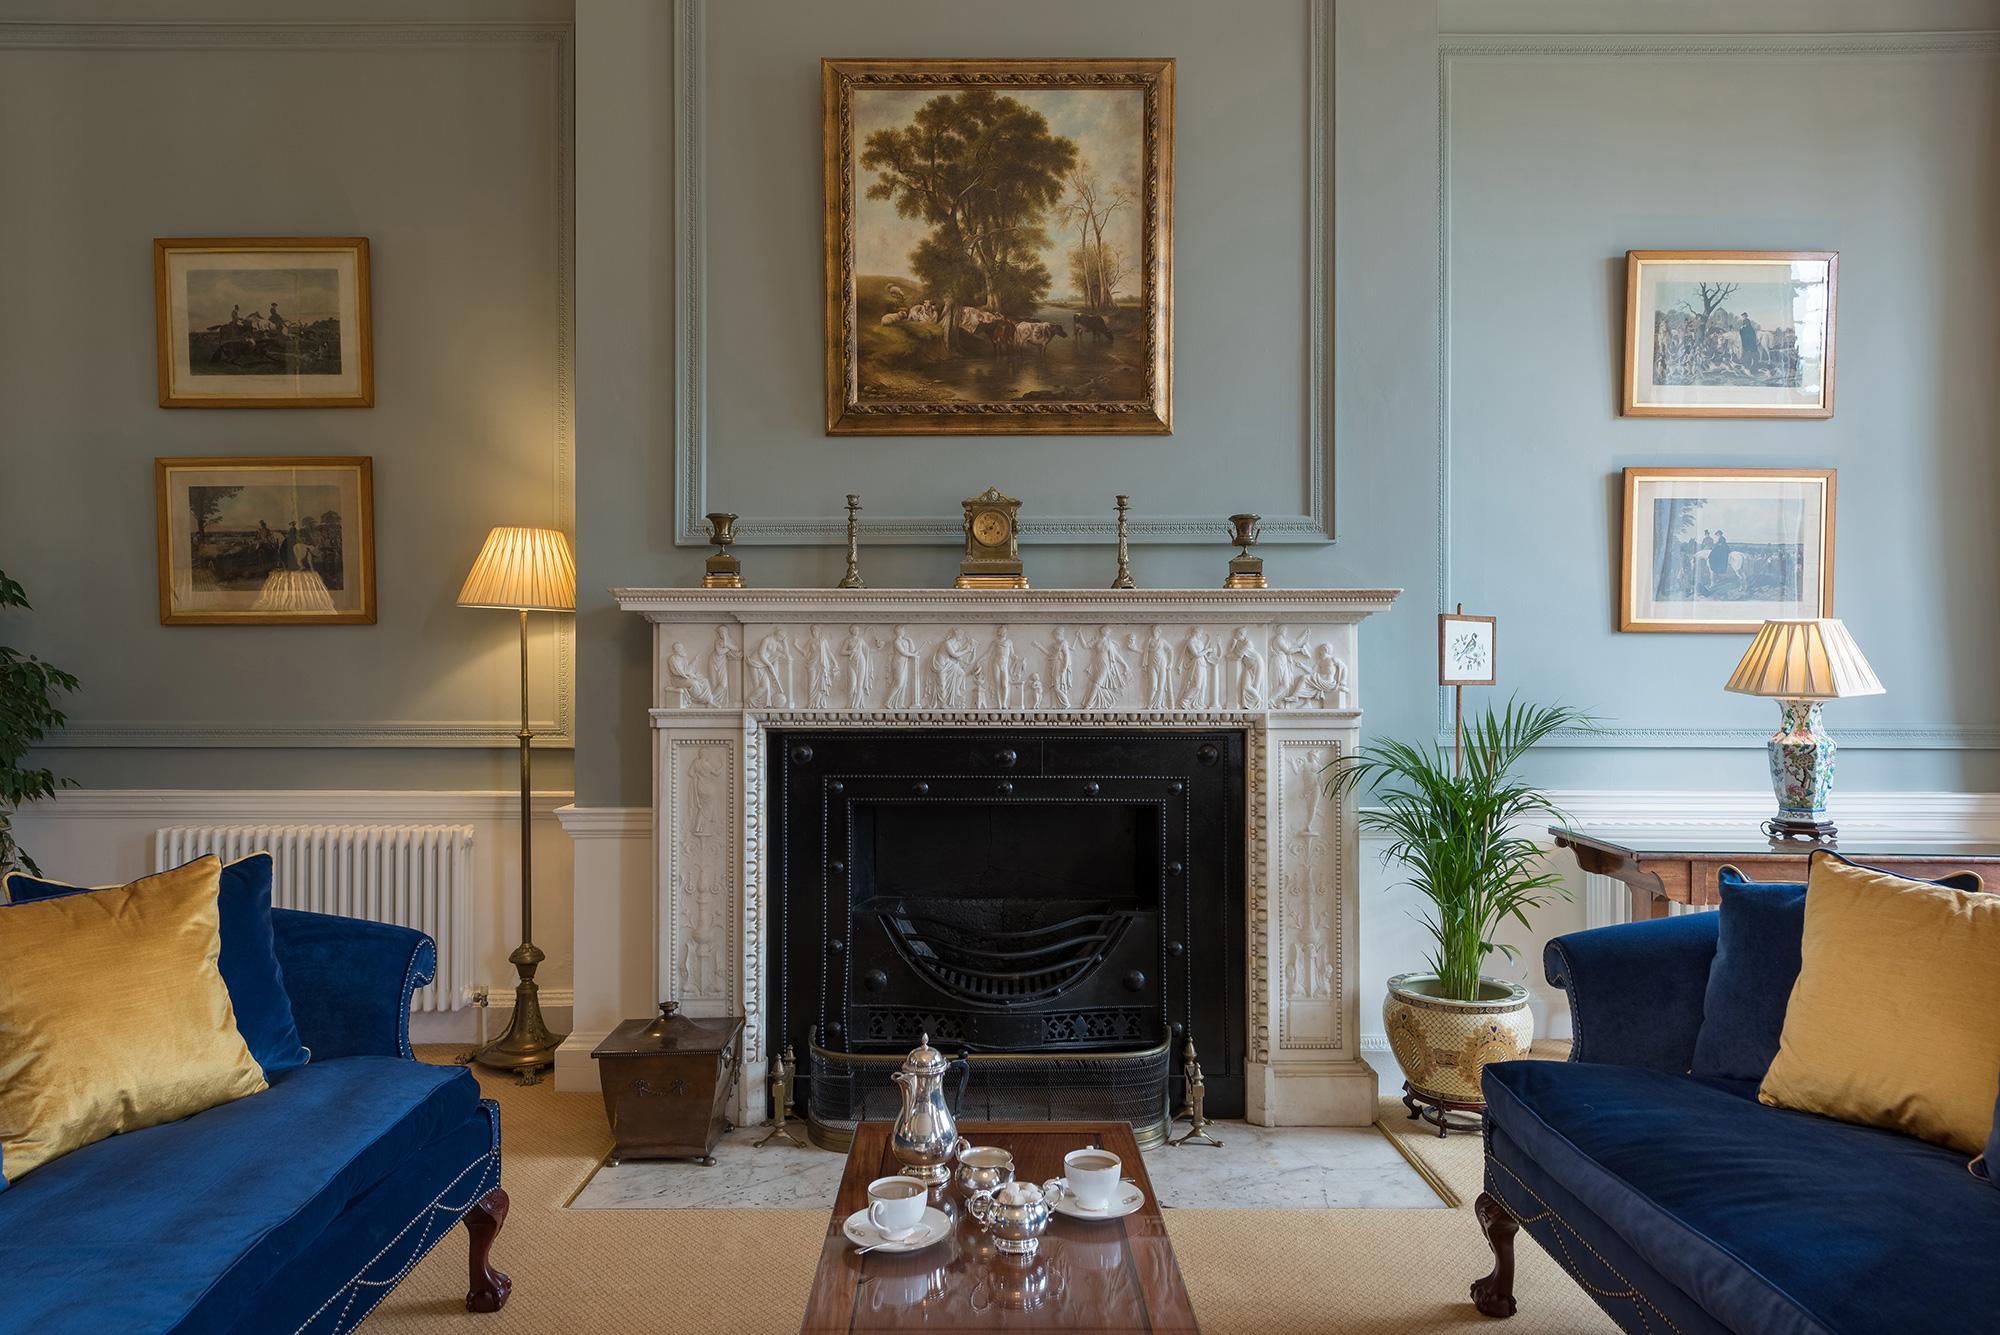 hotel-lounge-fireplace.jpg